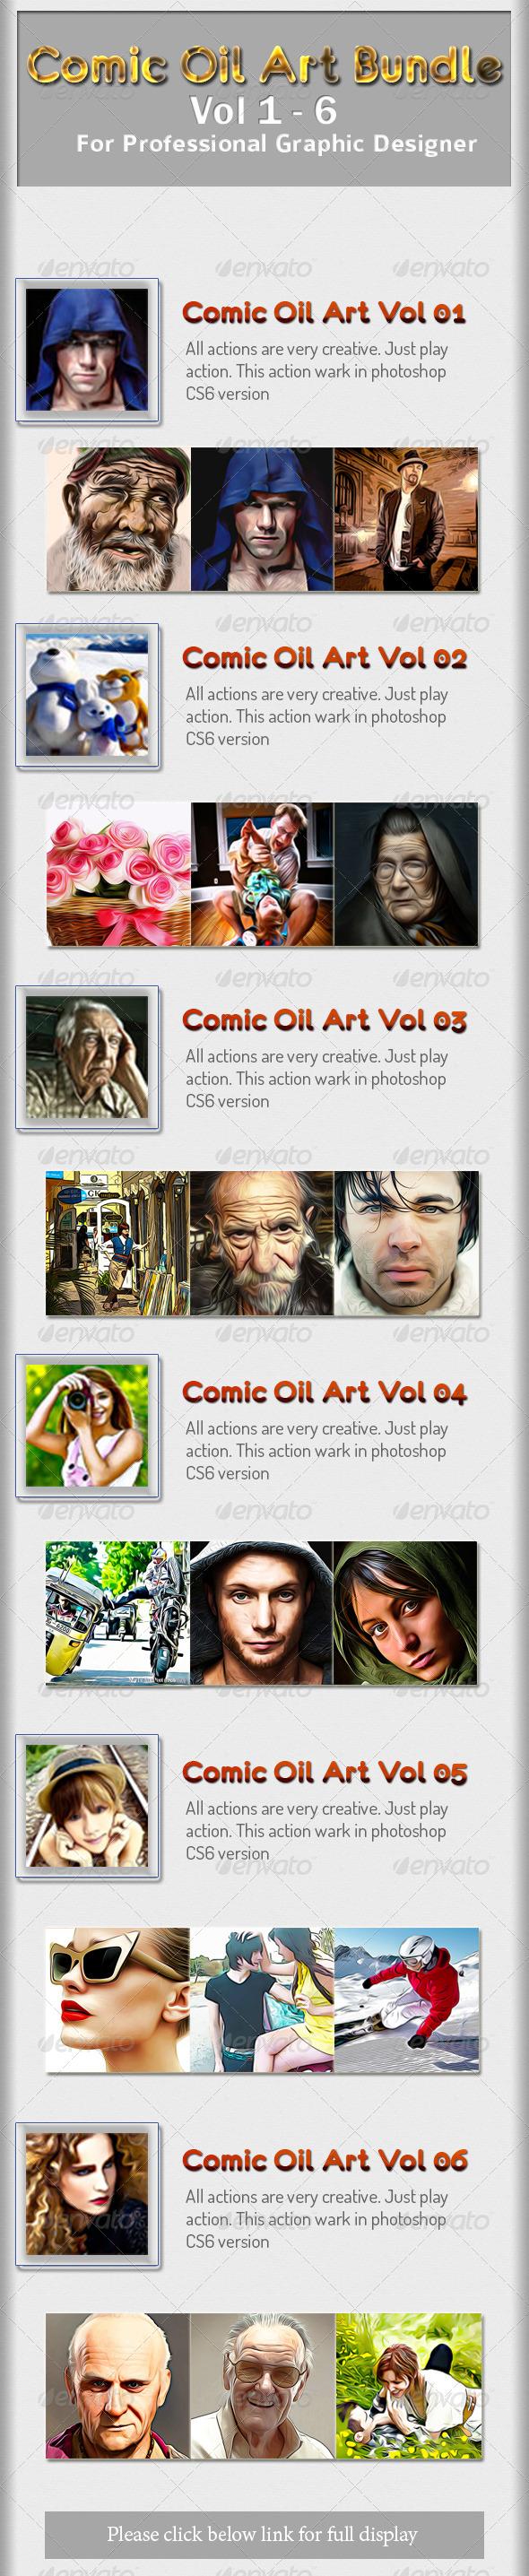 GraphicRiver Comic Oil Art Bundle Vol 1 to 6 8422878